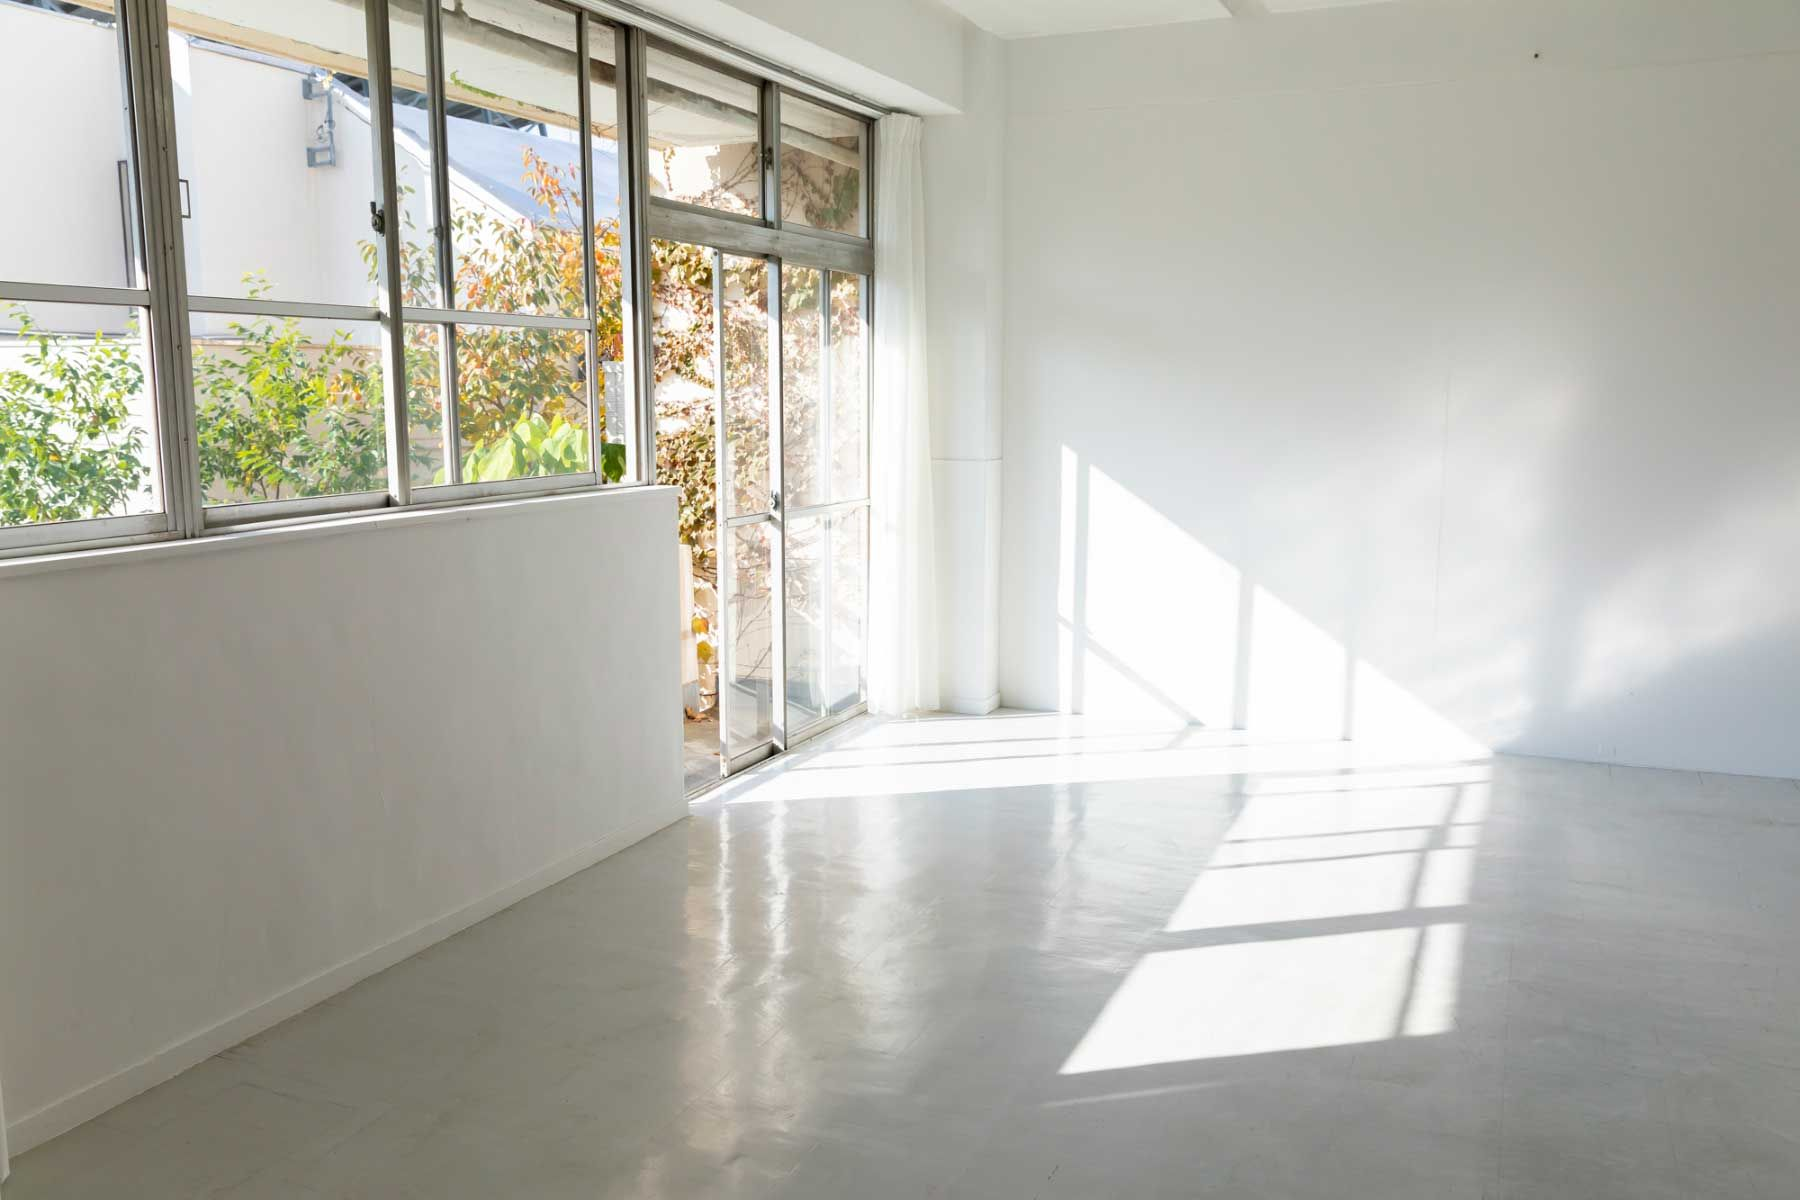 STUDIO NONAMES MEJIRO (スタジオ ノナメス メジロ)南向きの窓